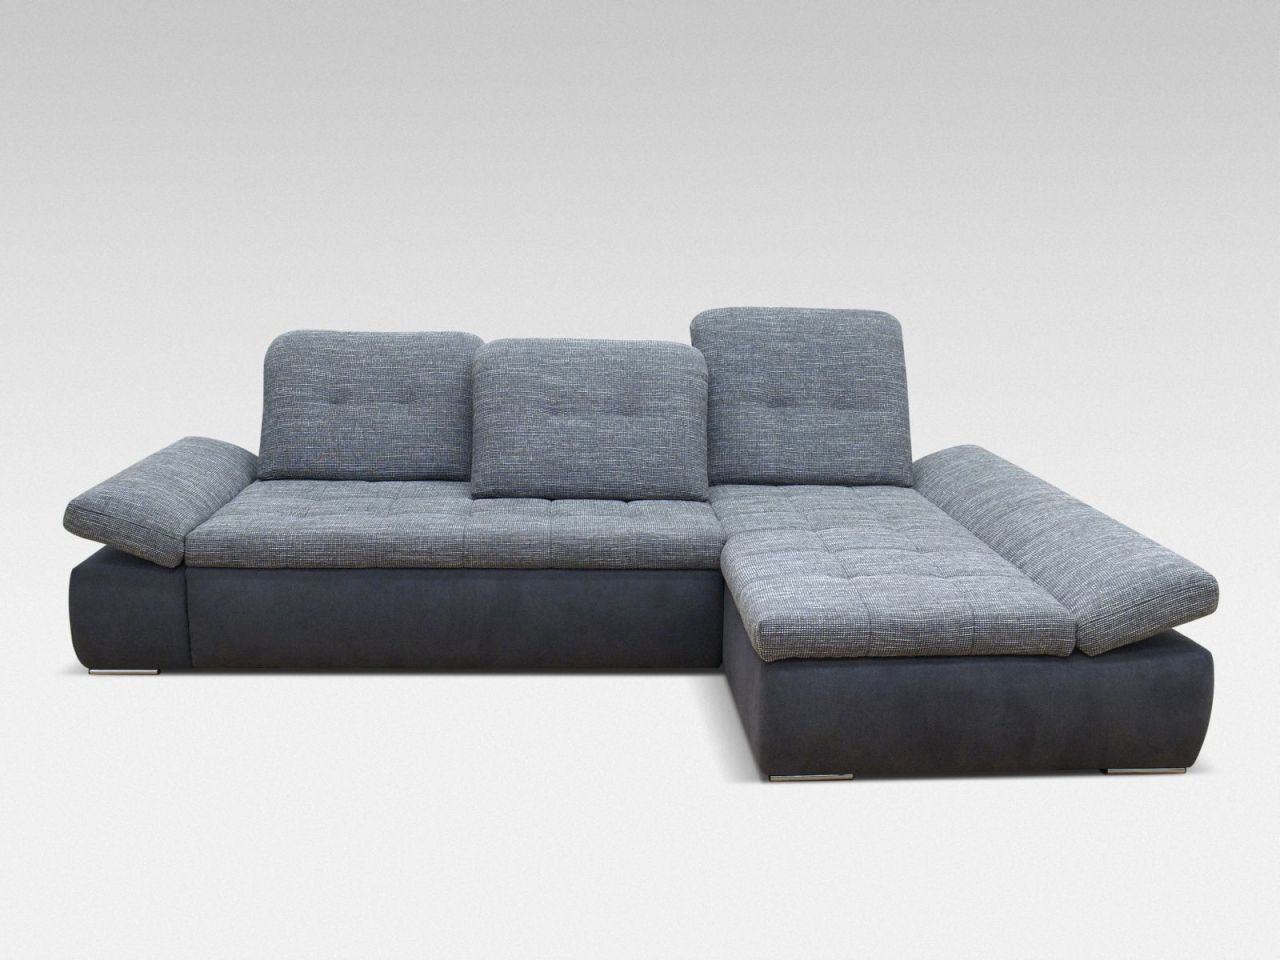 ecksofa armlehnen r cken bett funktionen. Black Bedroom Furniture Sets. Home Design Ideas